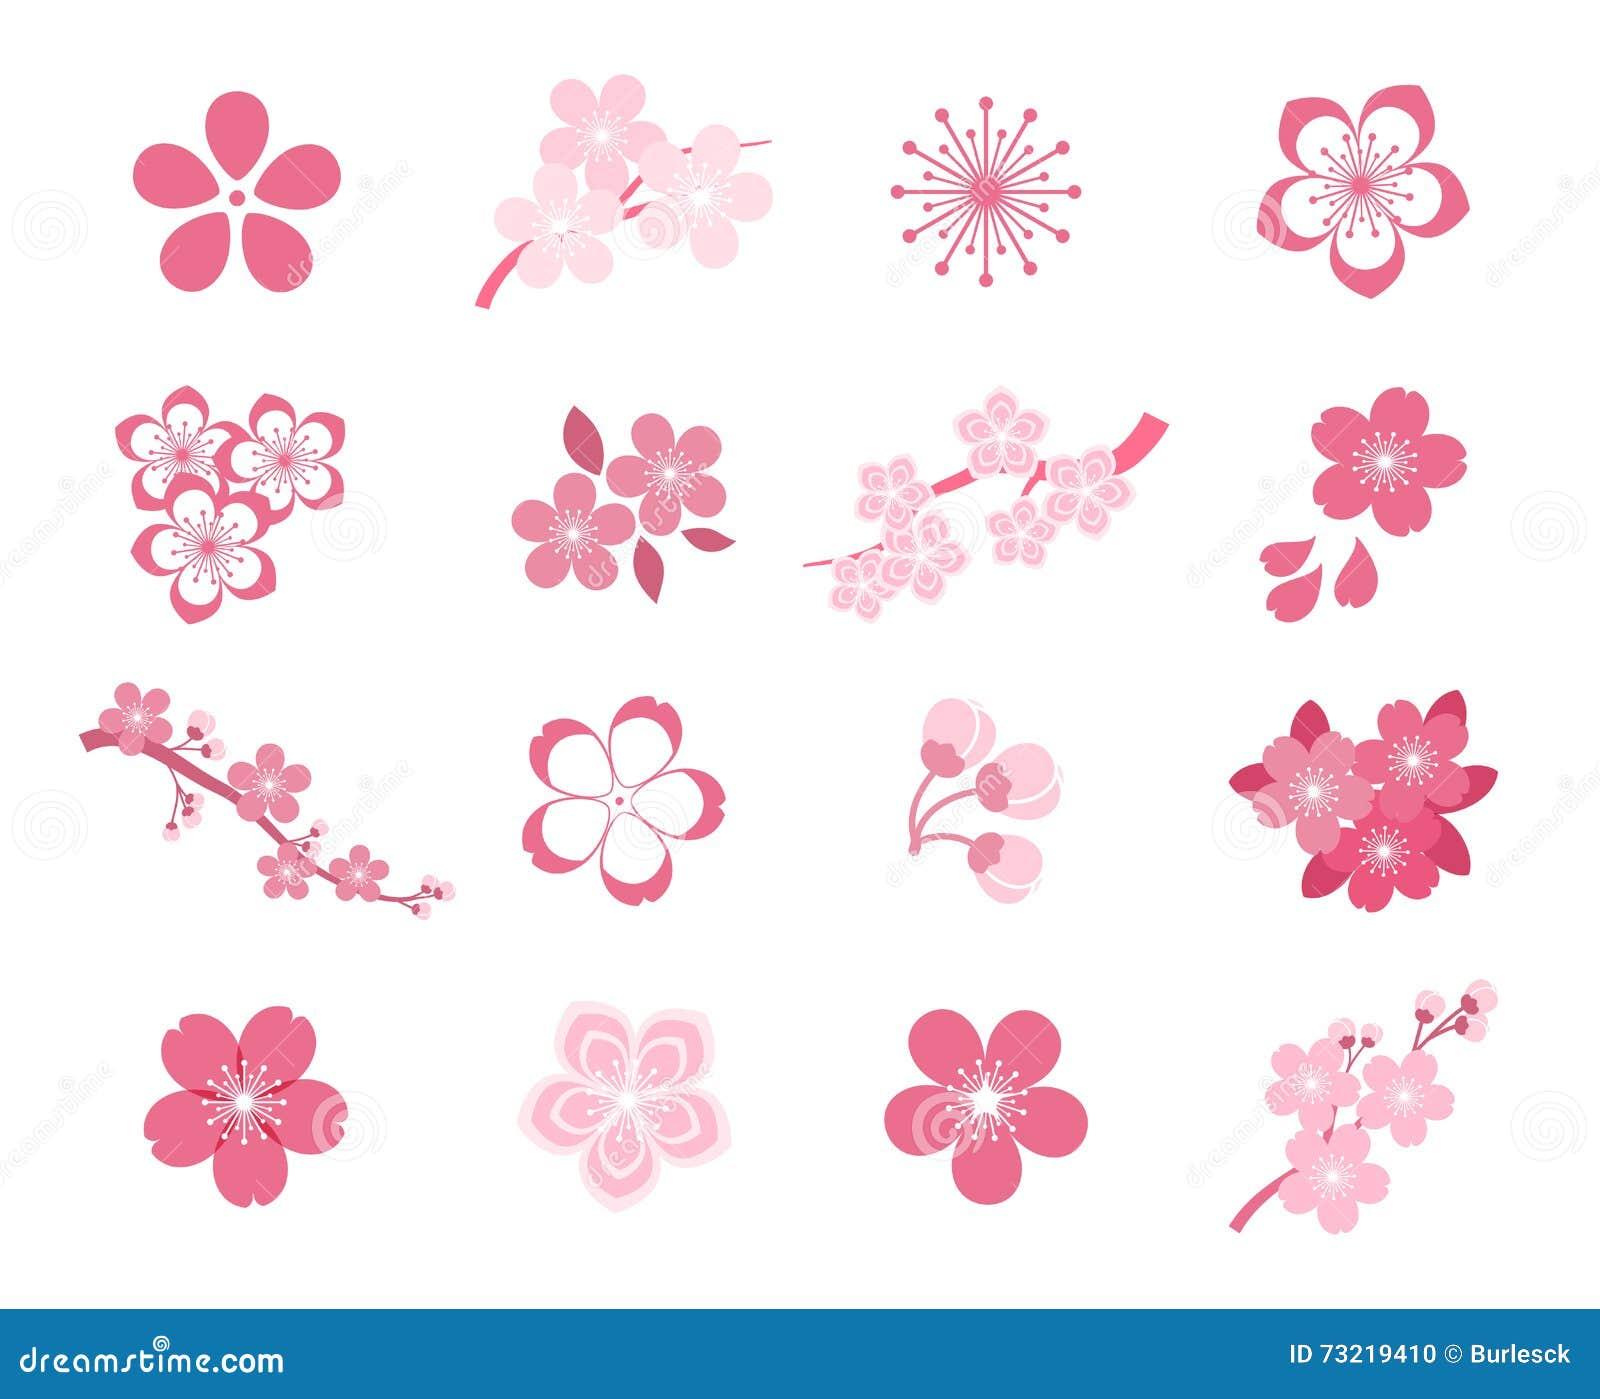 Kirschblüten-Japanerkirschblüte-Vektorikonensatz